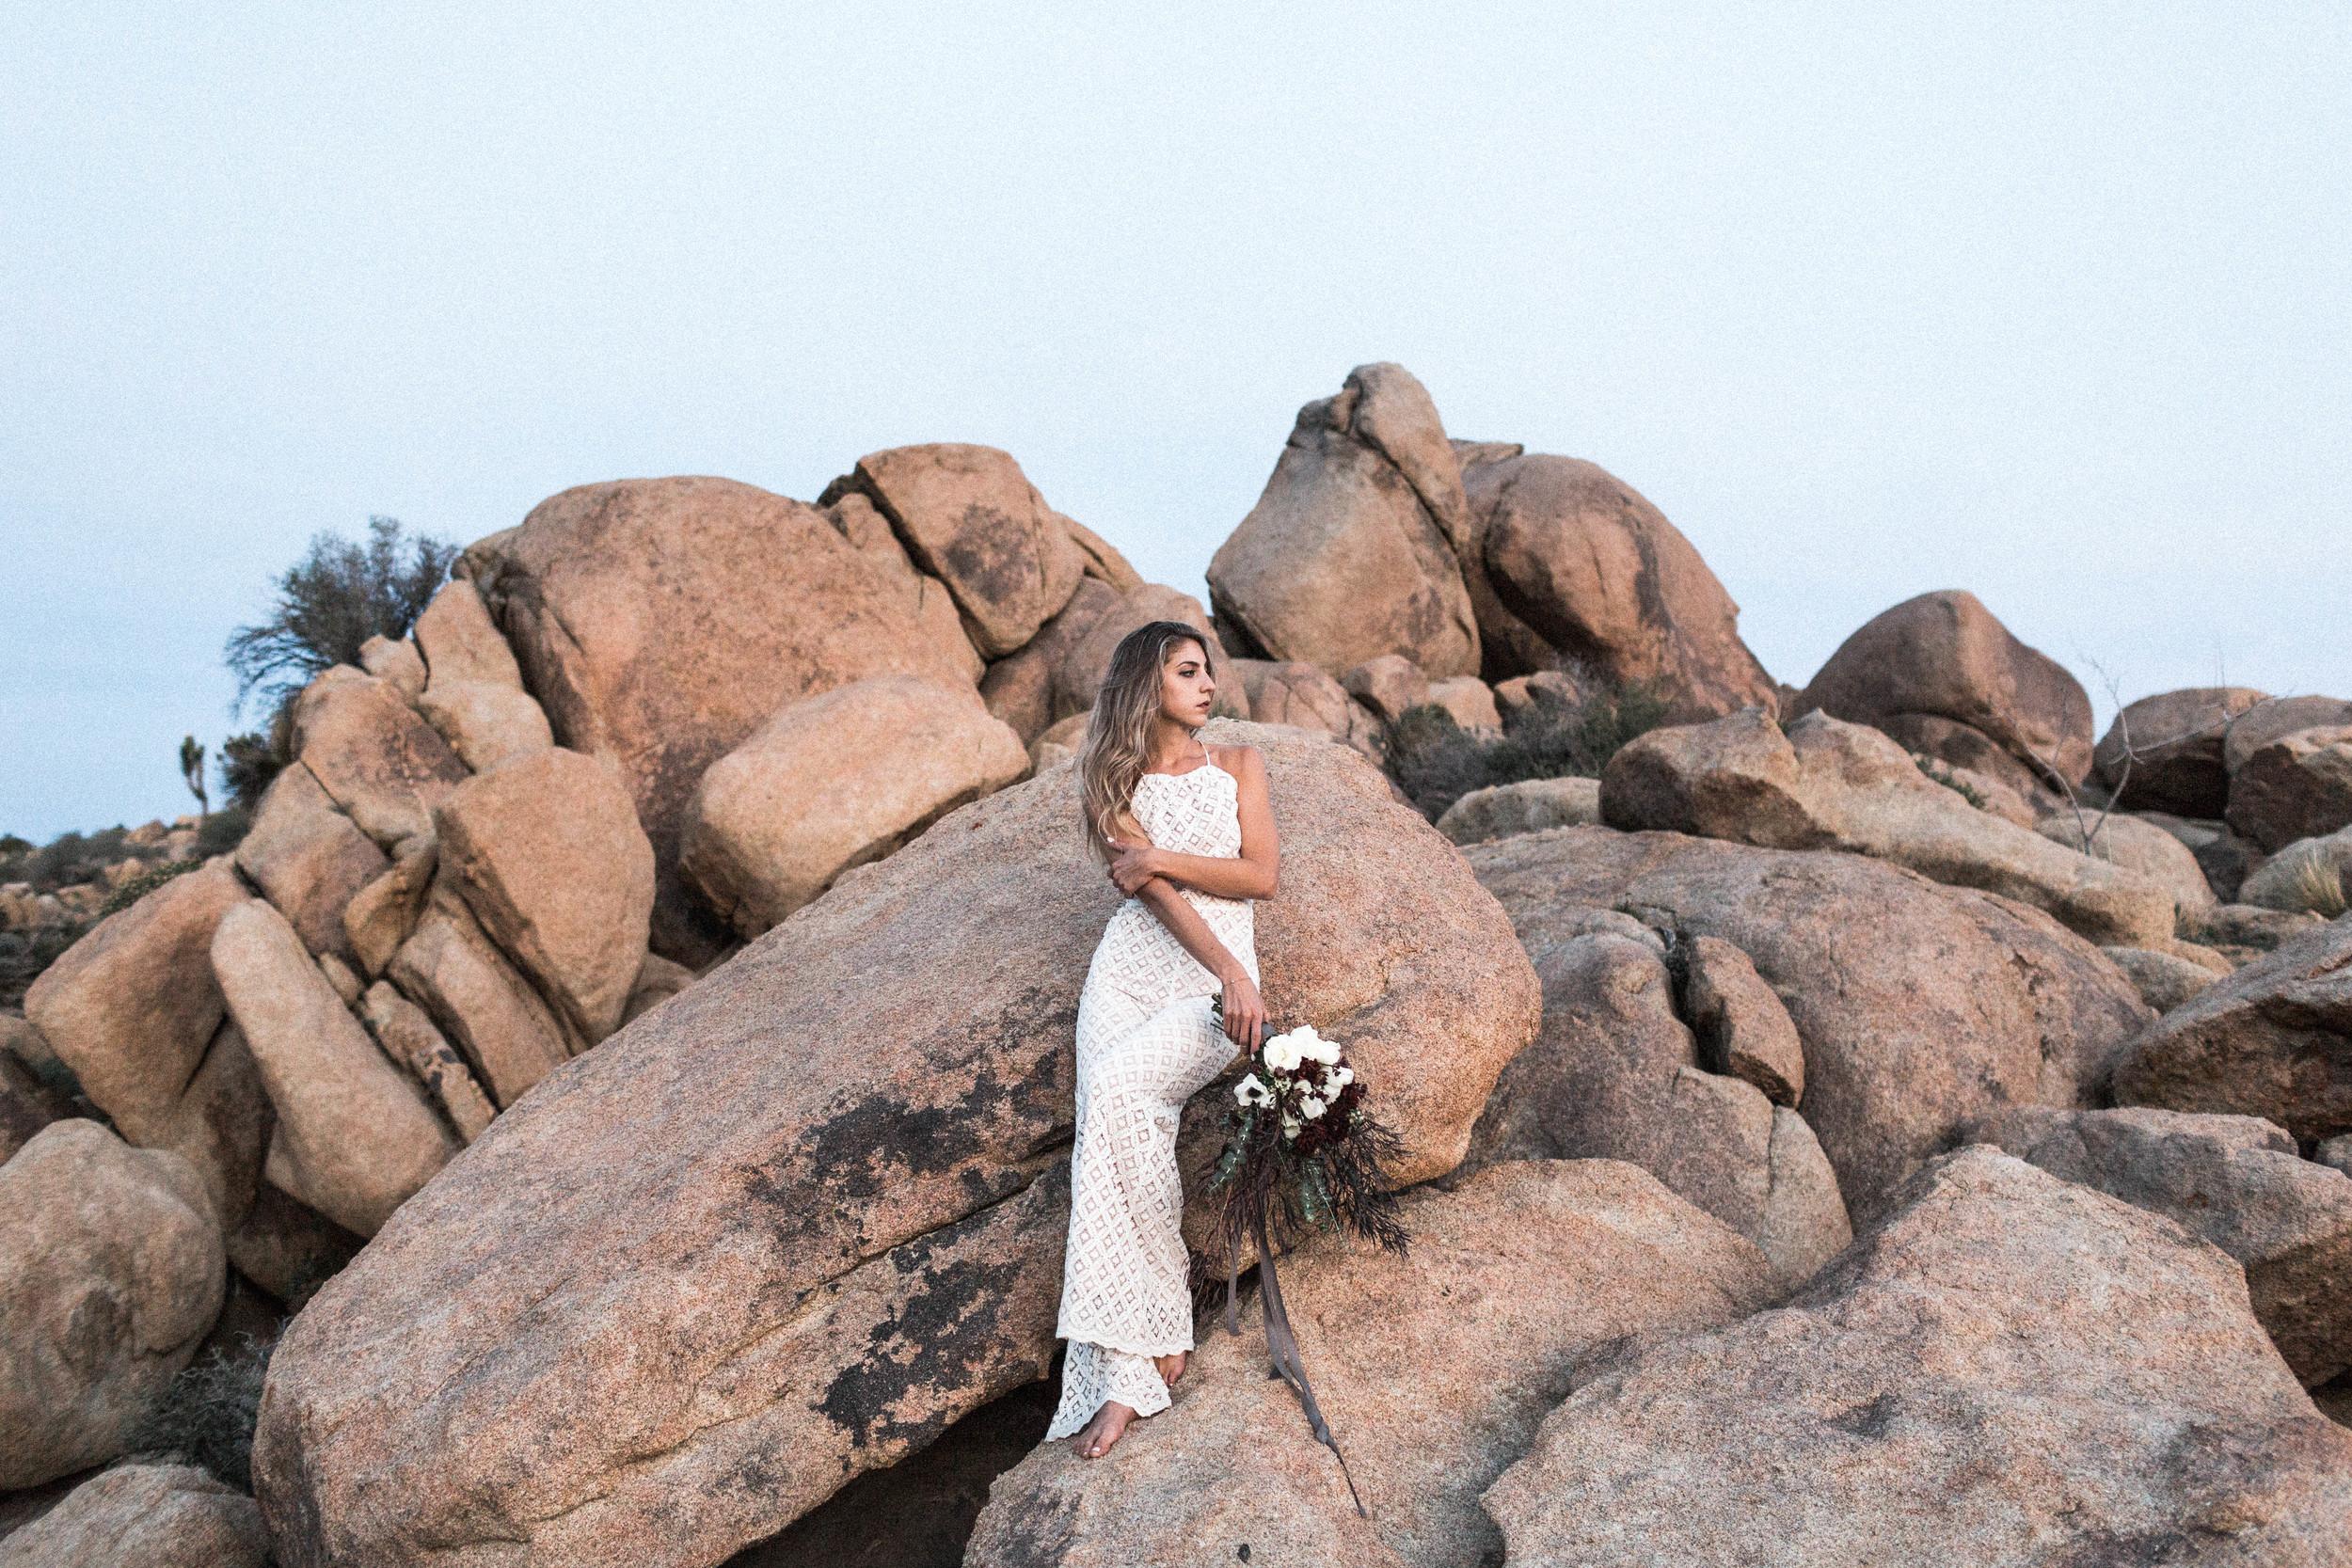 joshua-tree-wedding-editorial-photography-by-sarah-falugo-photography-7780.jpg